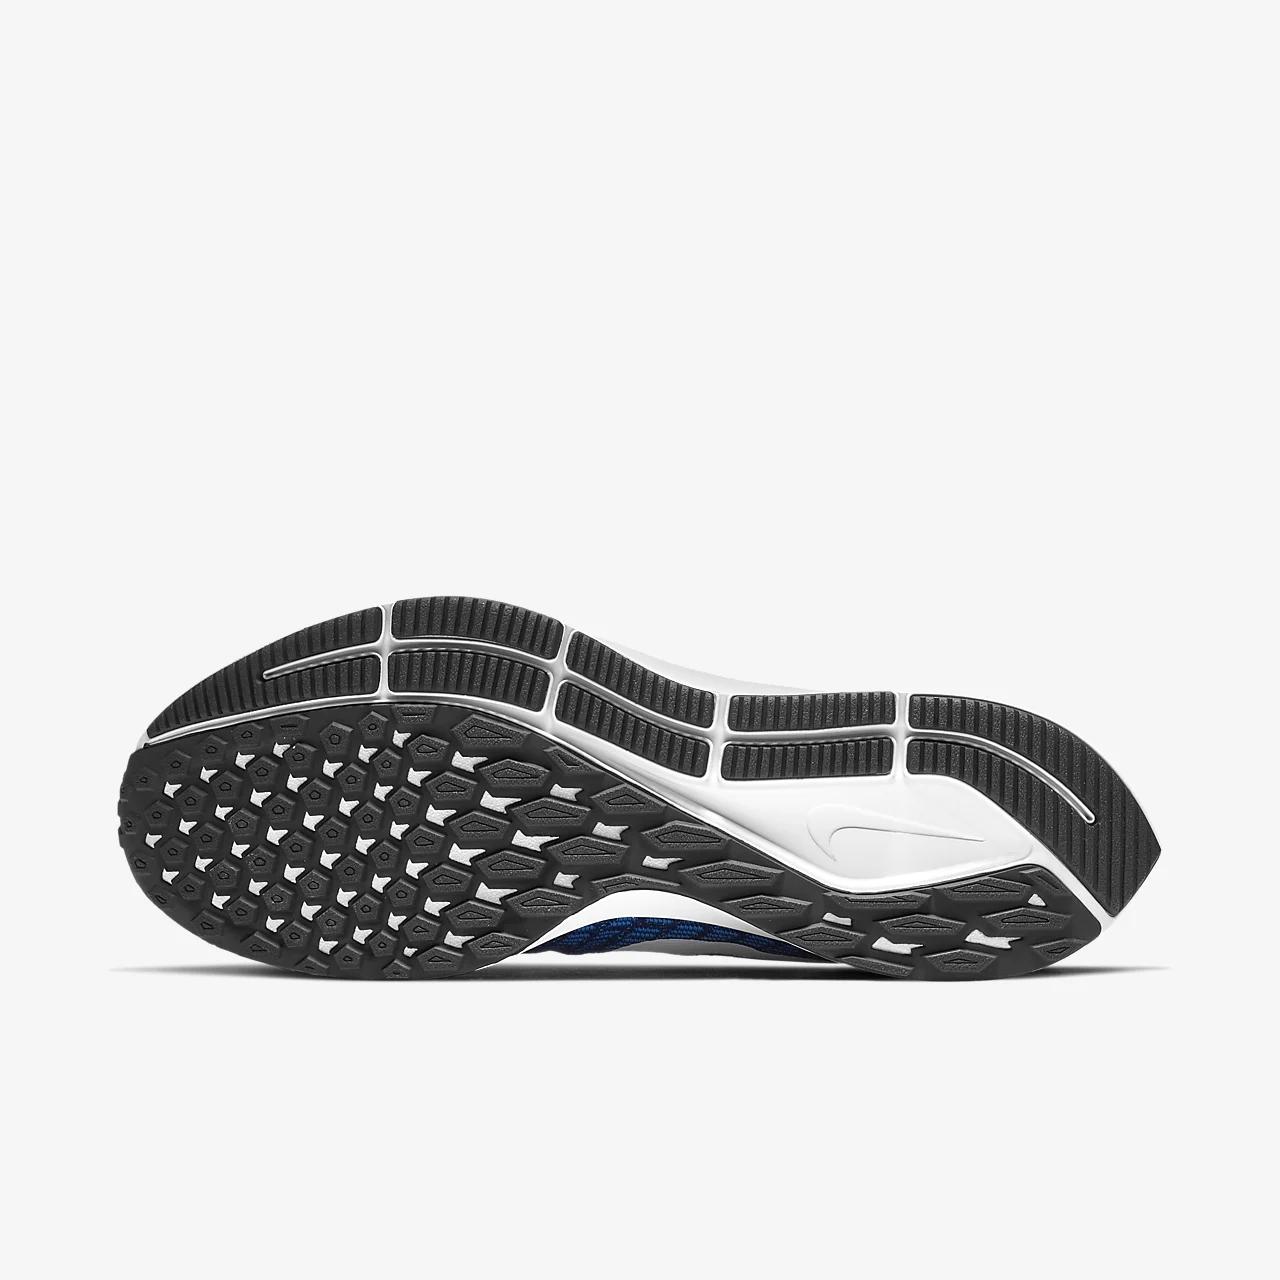 Nike Air Zoom Pegasus 35 Men's Running Shoe 942851-404